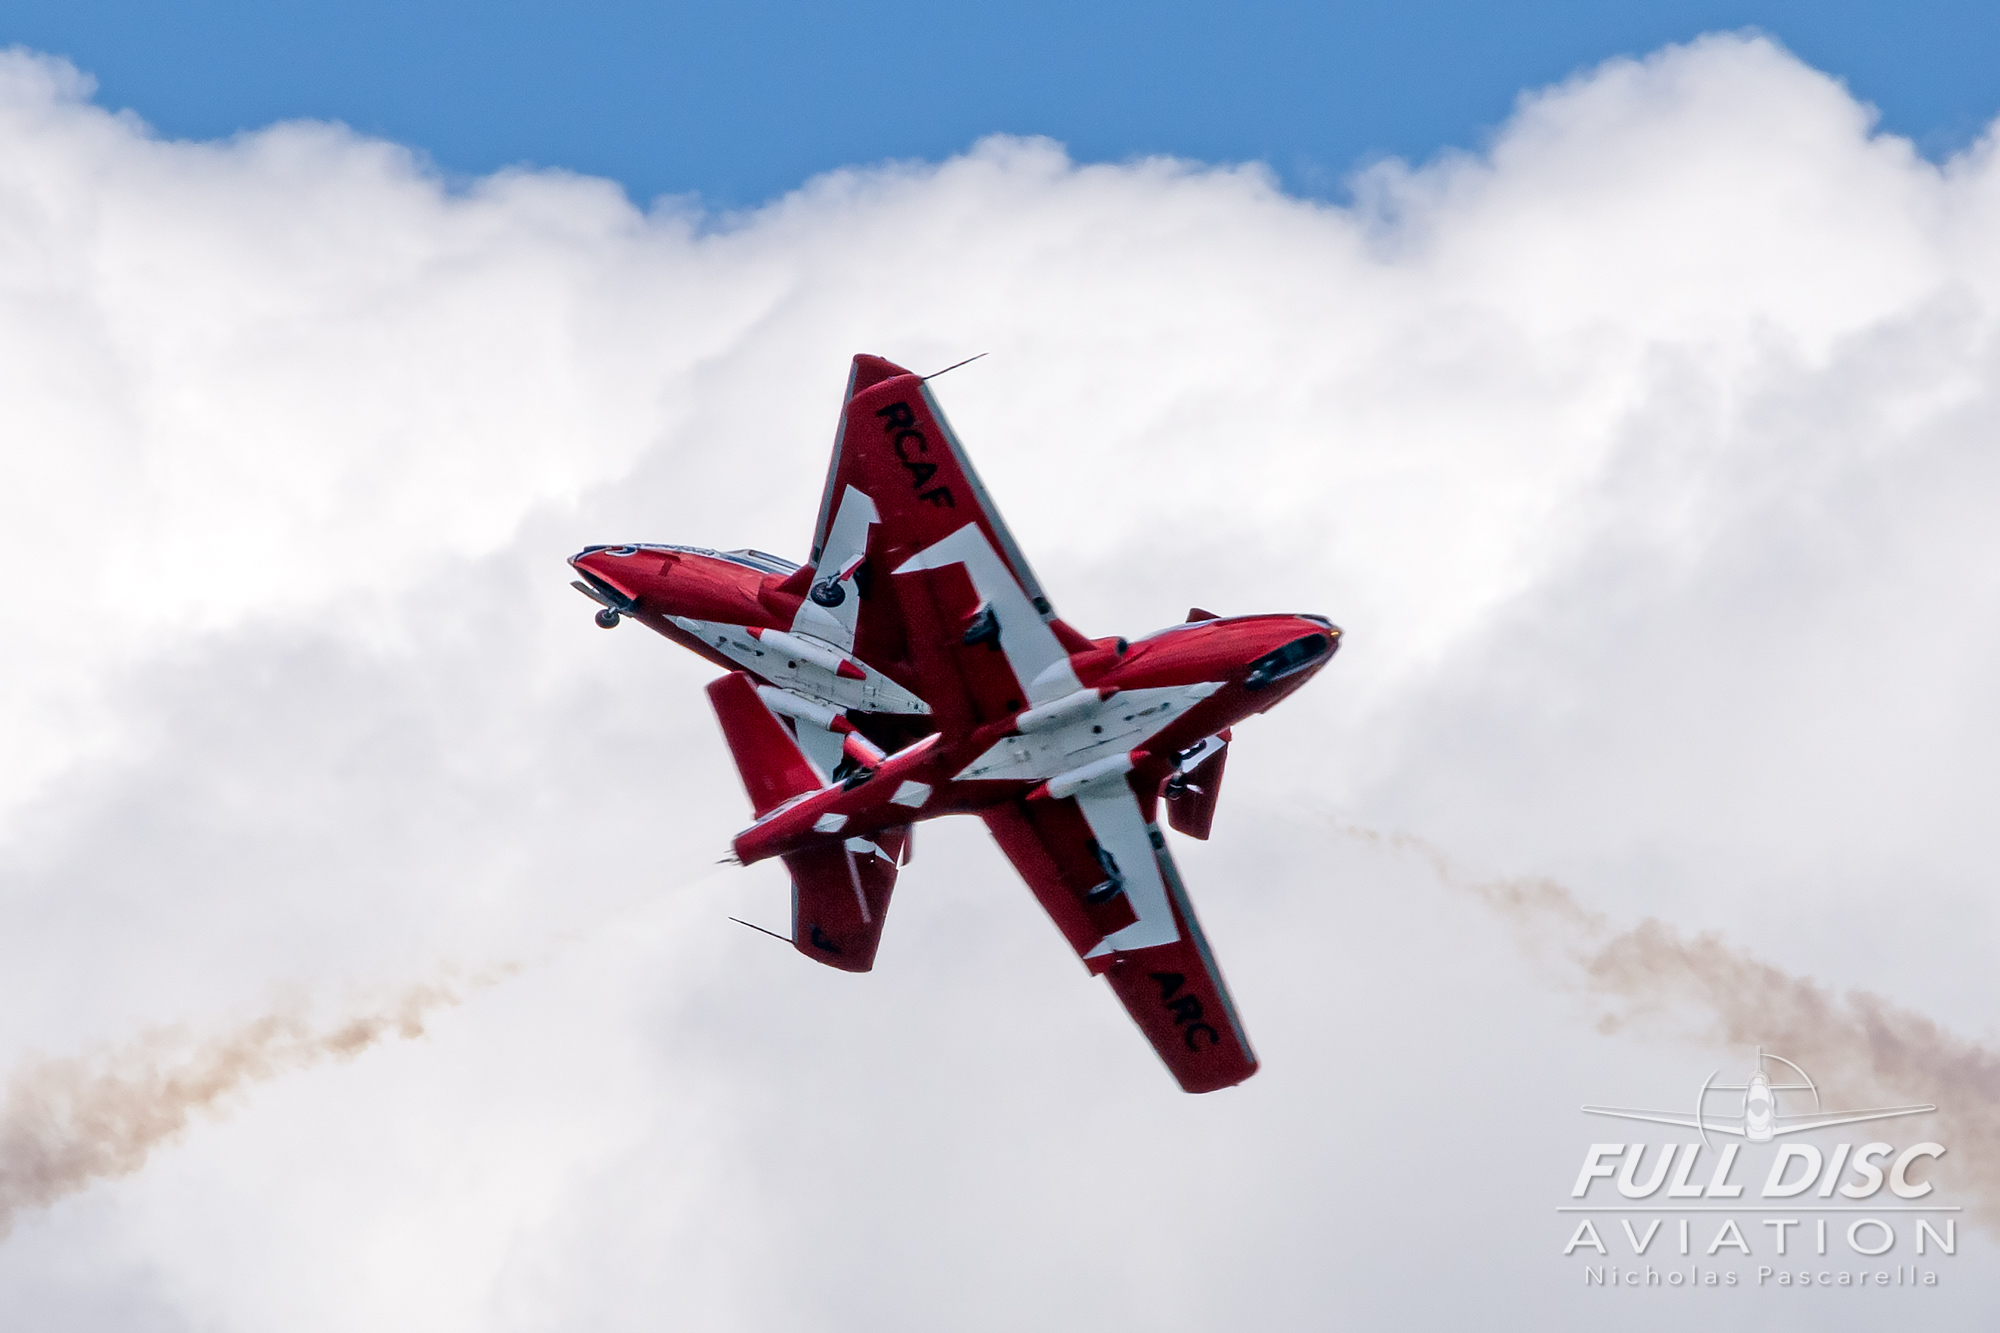 nickpascarella_fulldiscaviation_oceancityairshow_aviation_snowbirds_dirtycross.jpg